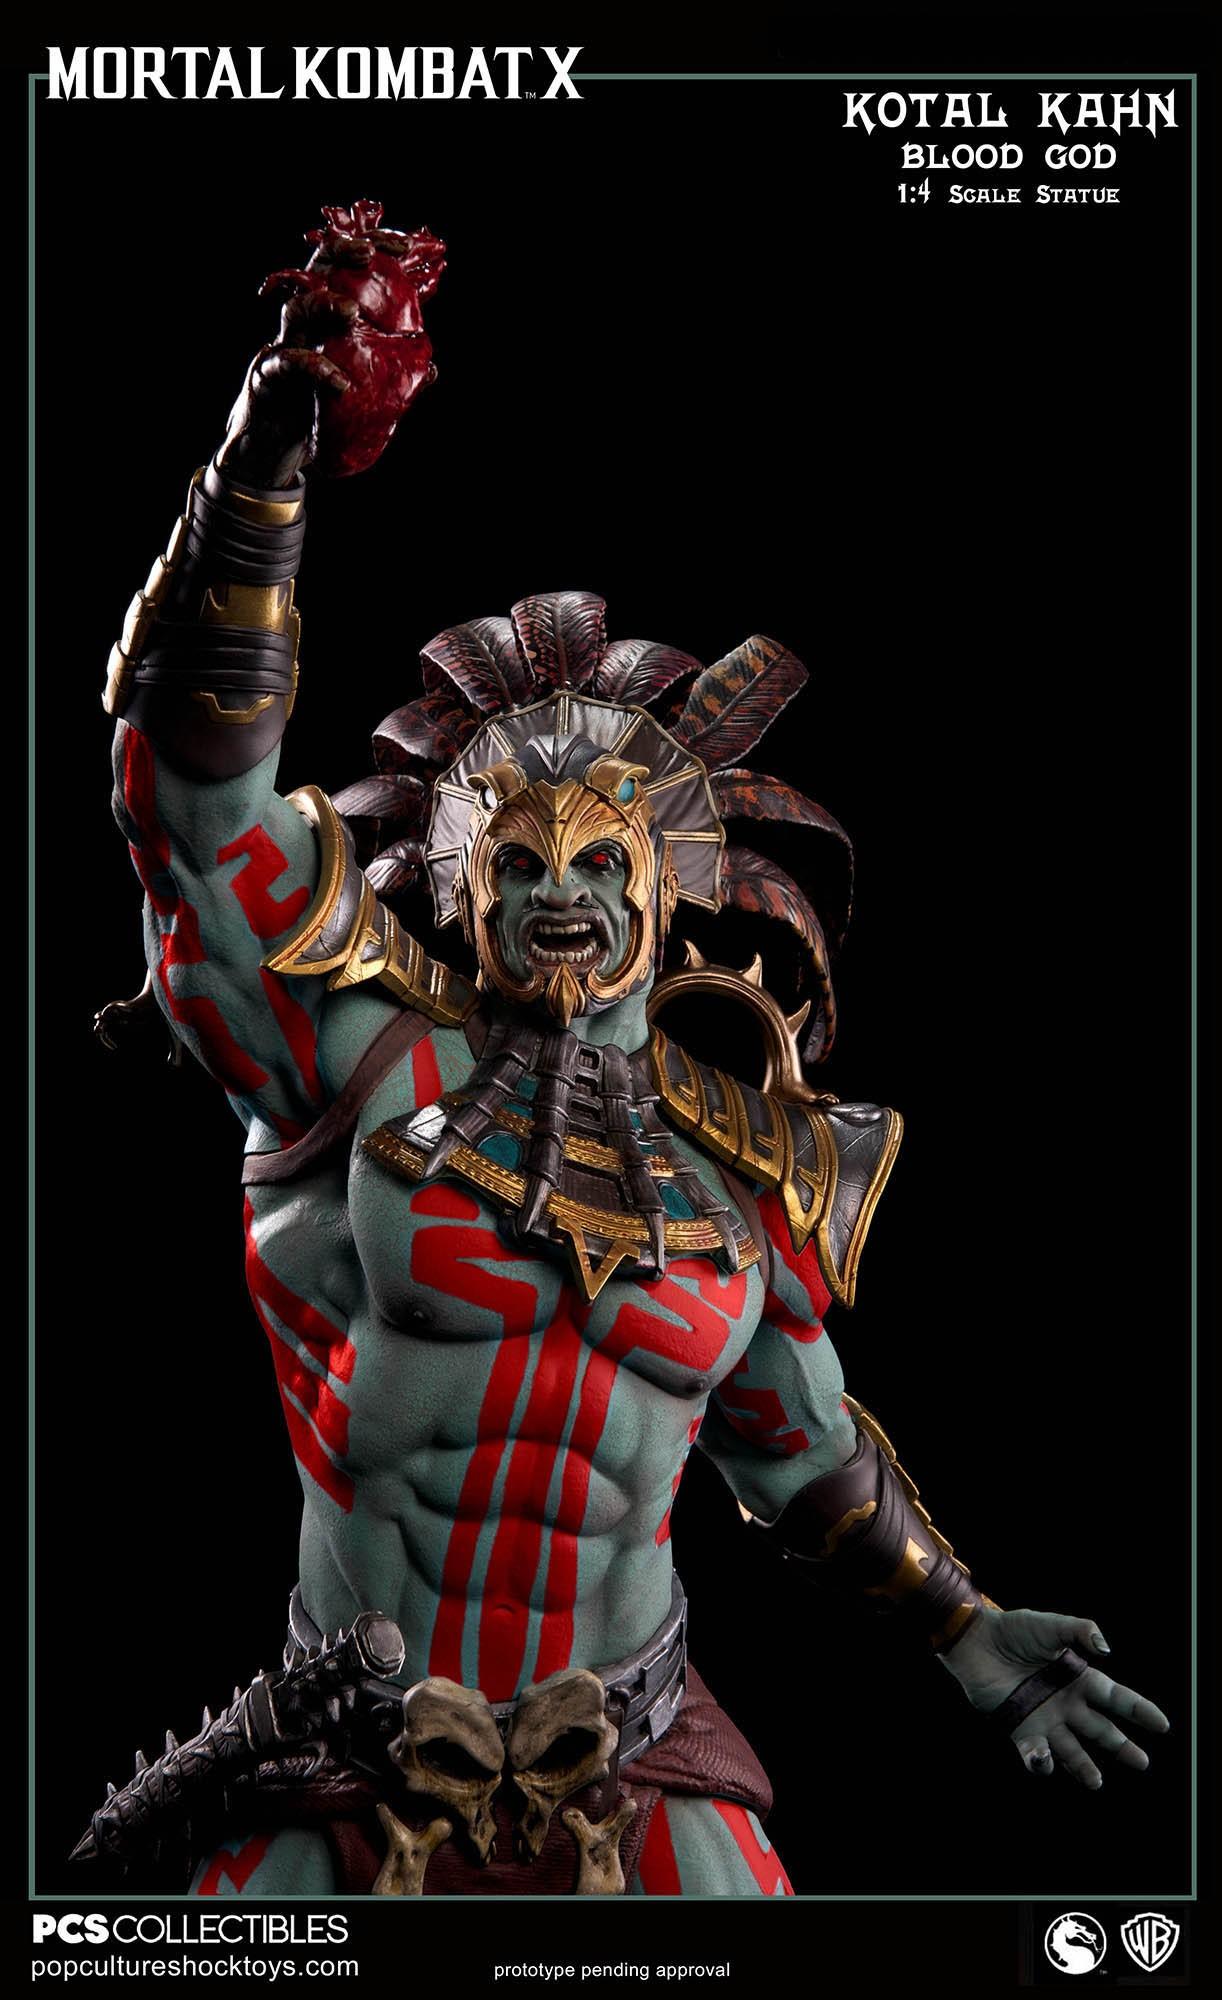 [Pop Culture Shock] Mortal Kombat X: Kotal Kahn 1:4 scale PCS-Kotal-Kahn-Blood-God-013